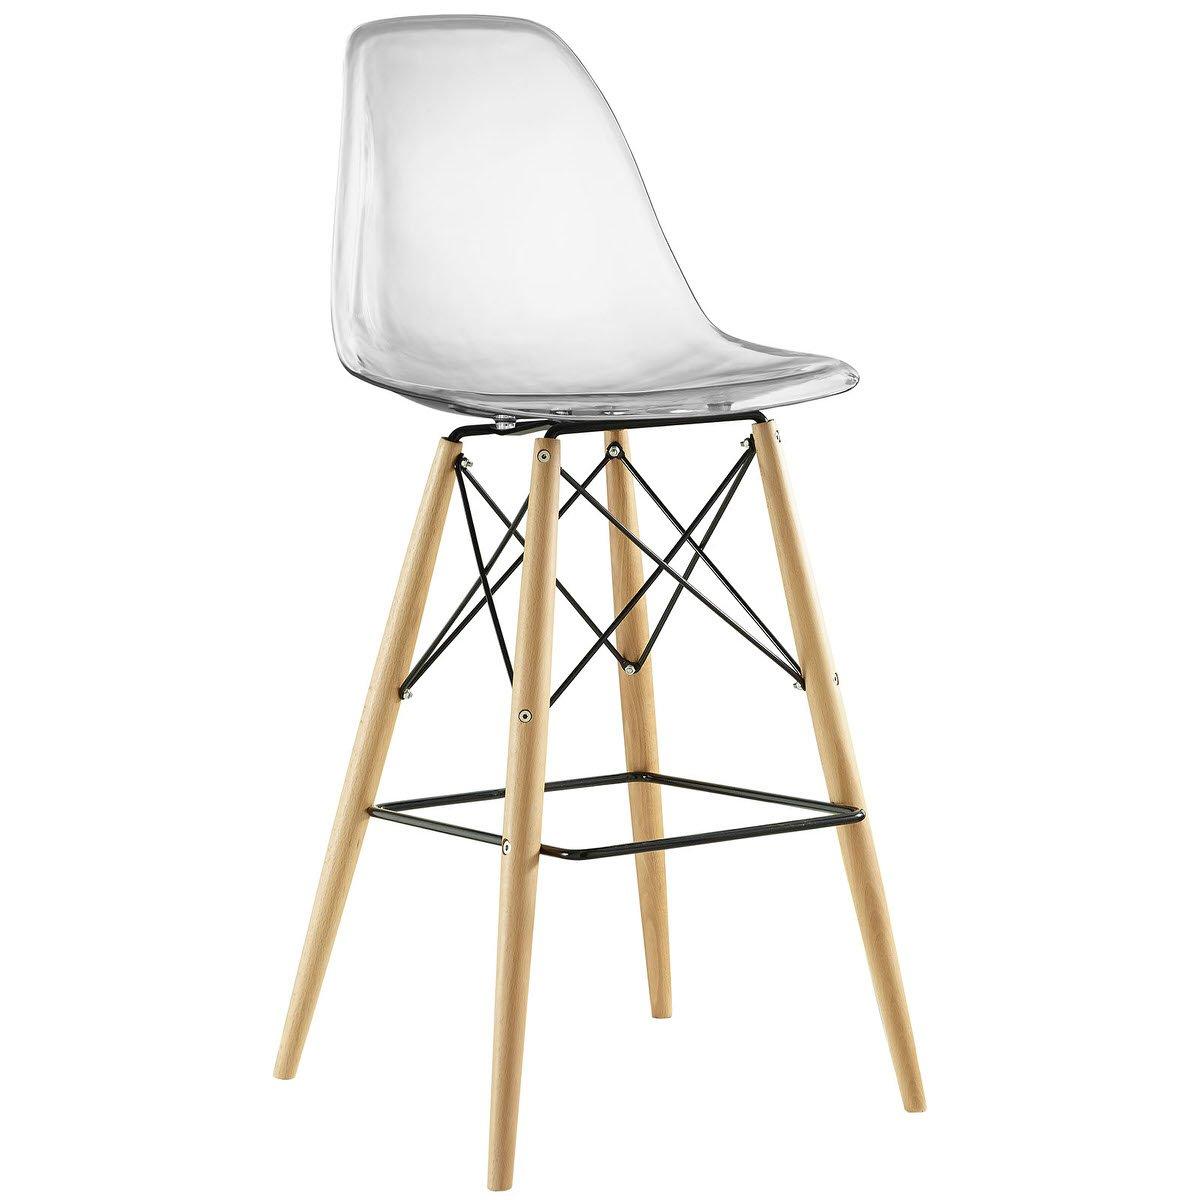 Pleasing Pyramid Bar Stool Clear By Modern Living Uwap Interior Chair Design Uwaporg